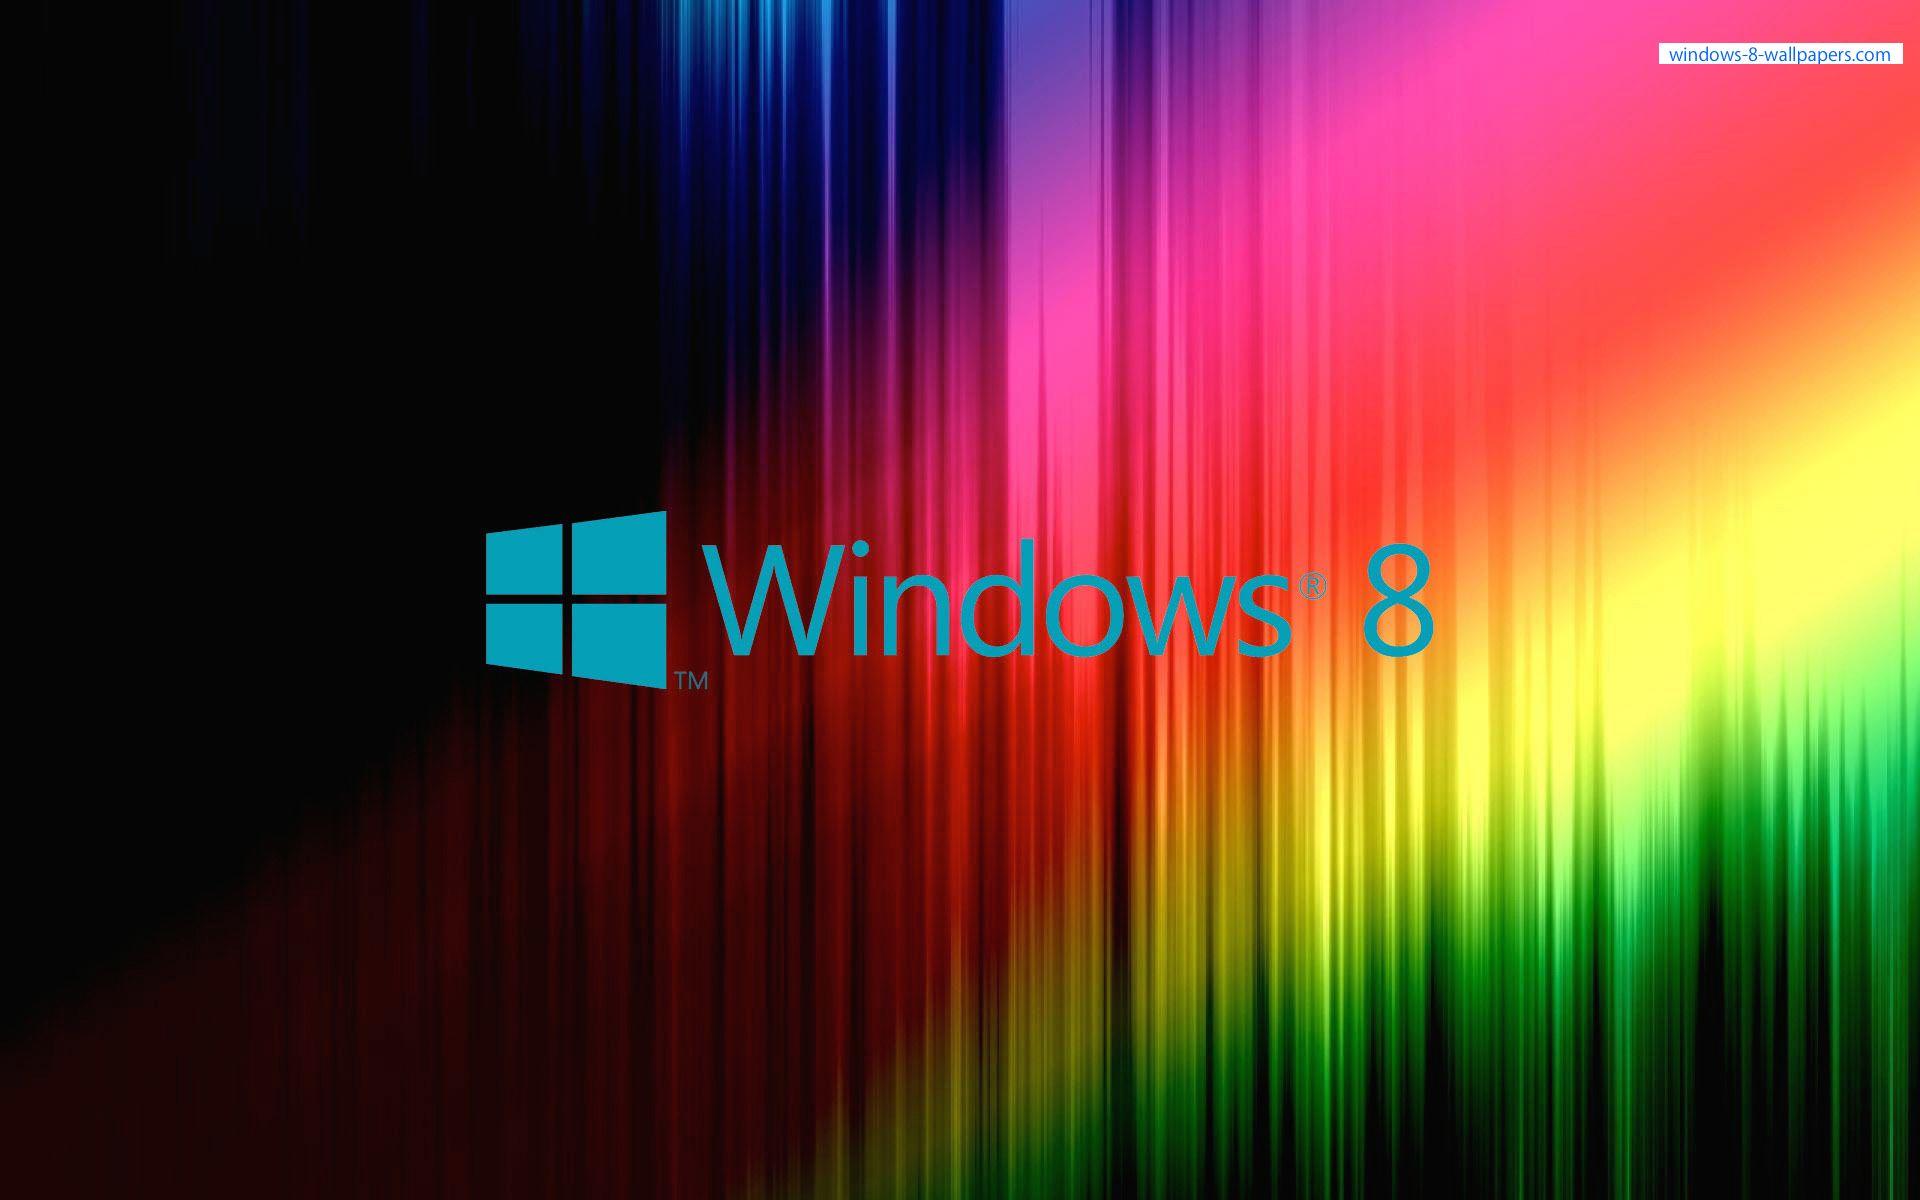 Windows 8 Computer Desktop Wallpaper Windows8 Windows81 Background Latest Wallpapers Computer Wallpaper Desktop Wallpapers Wallpaper